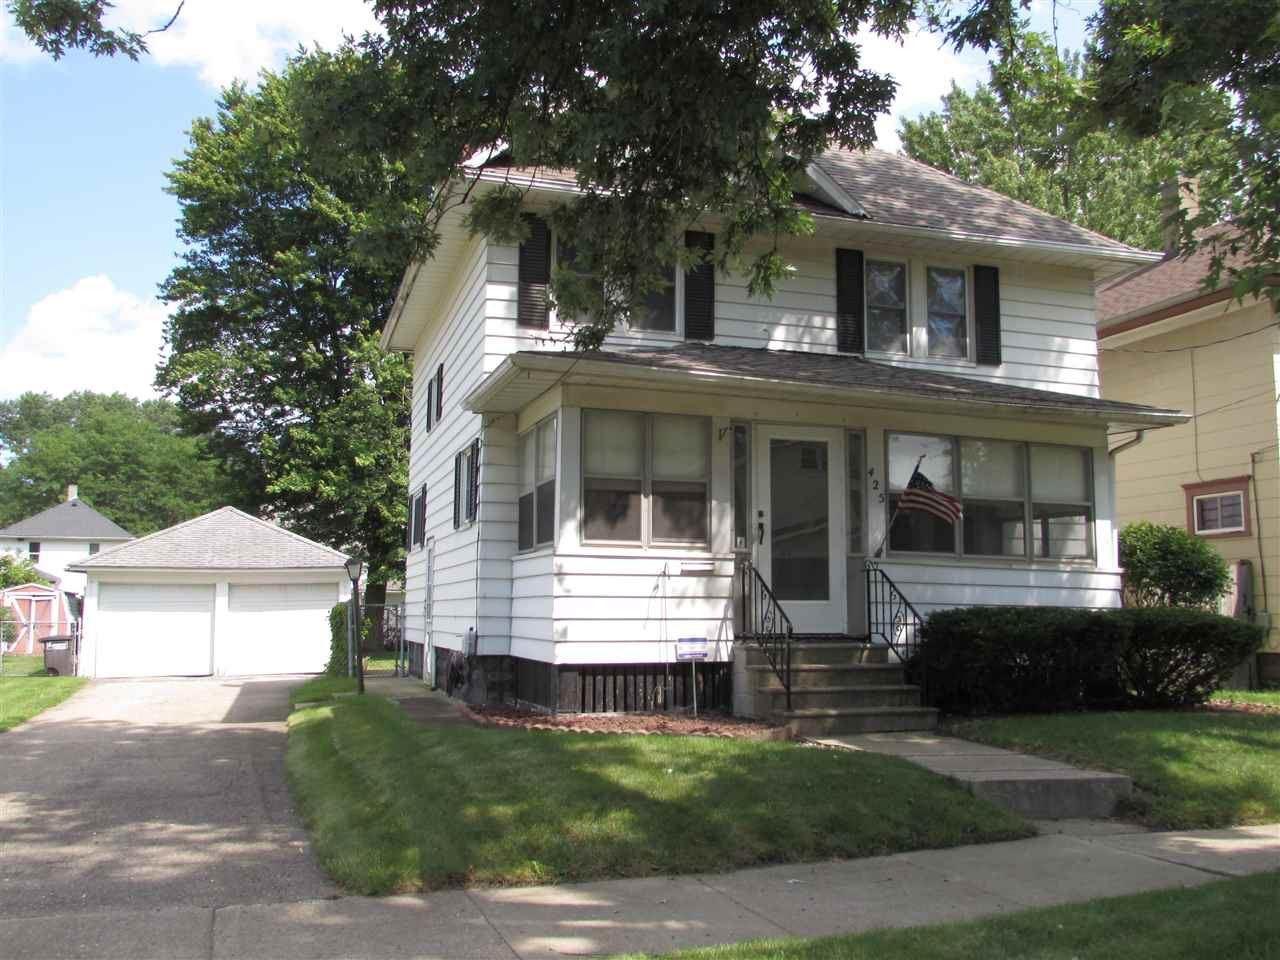 425 N PLEASANT ST, Jackson, MI 49202 - MLS#: 21097001